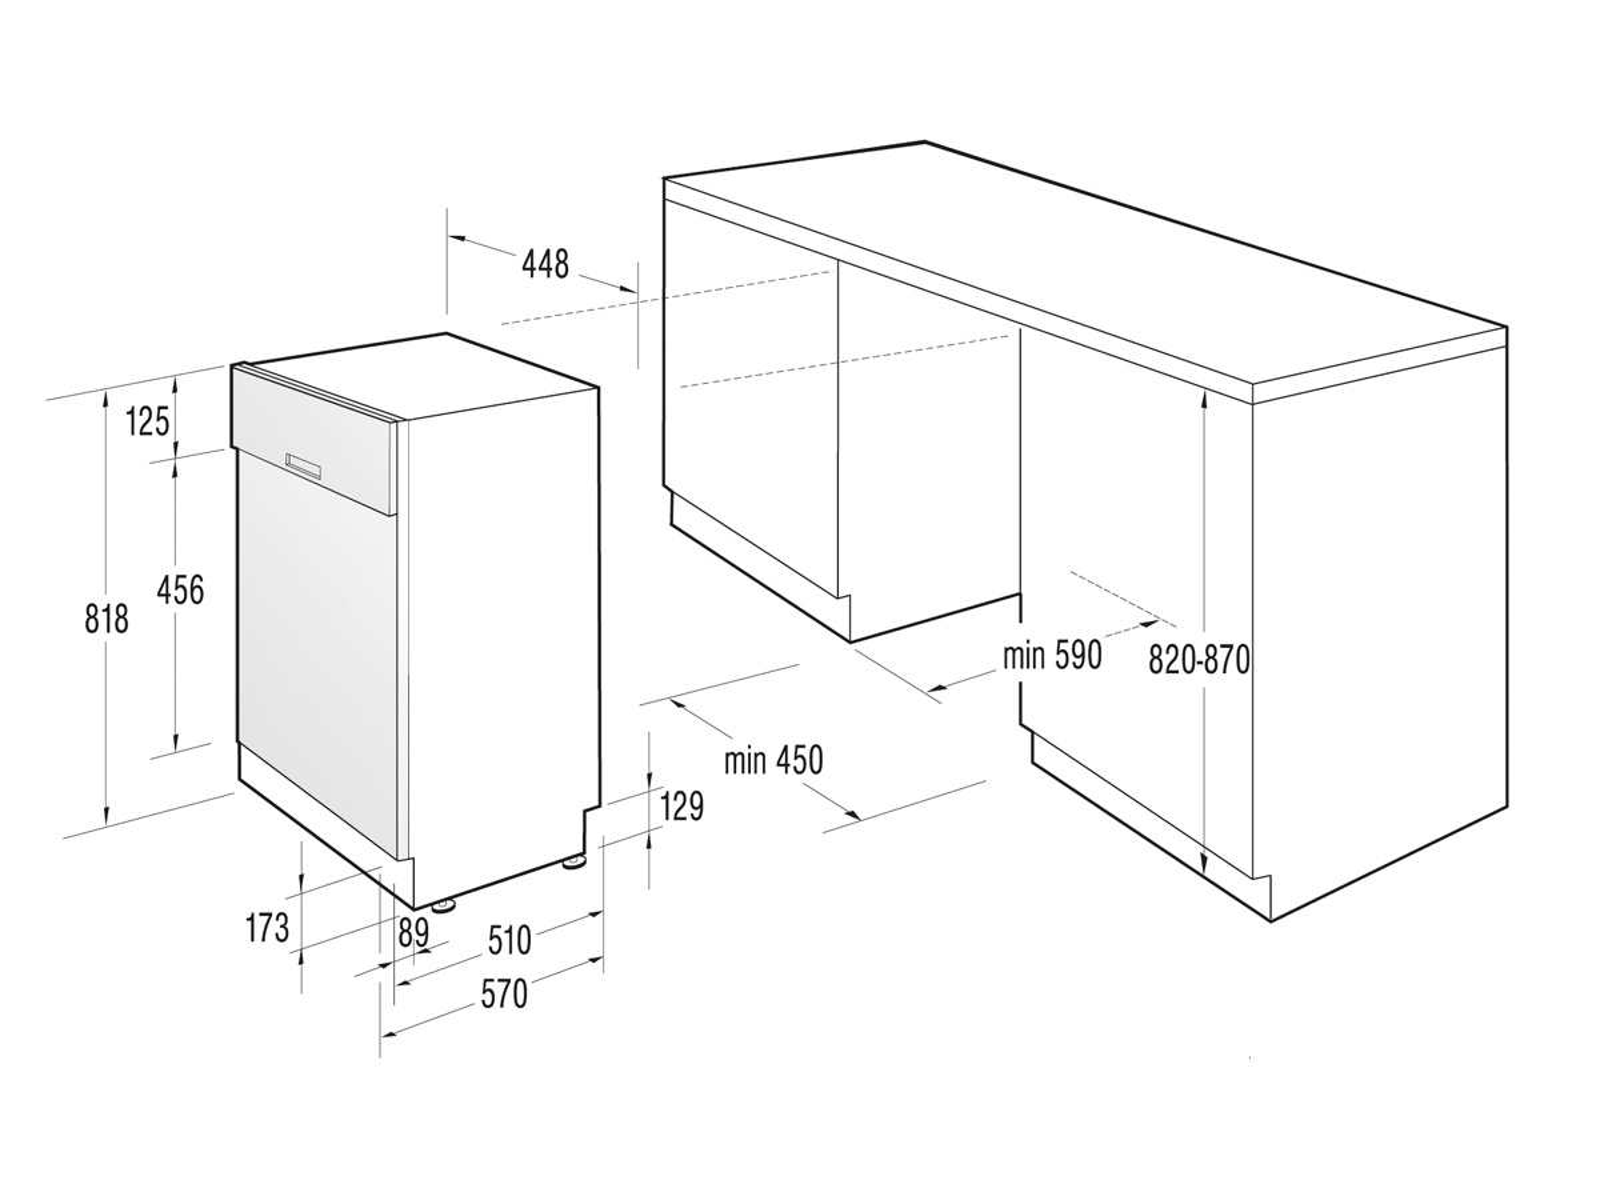 gorenje gi 50110 x teilintegrierbarer einbau. Black Bedroom Furniture Sets. Home Design Ideas